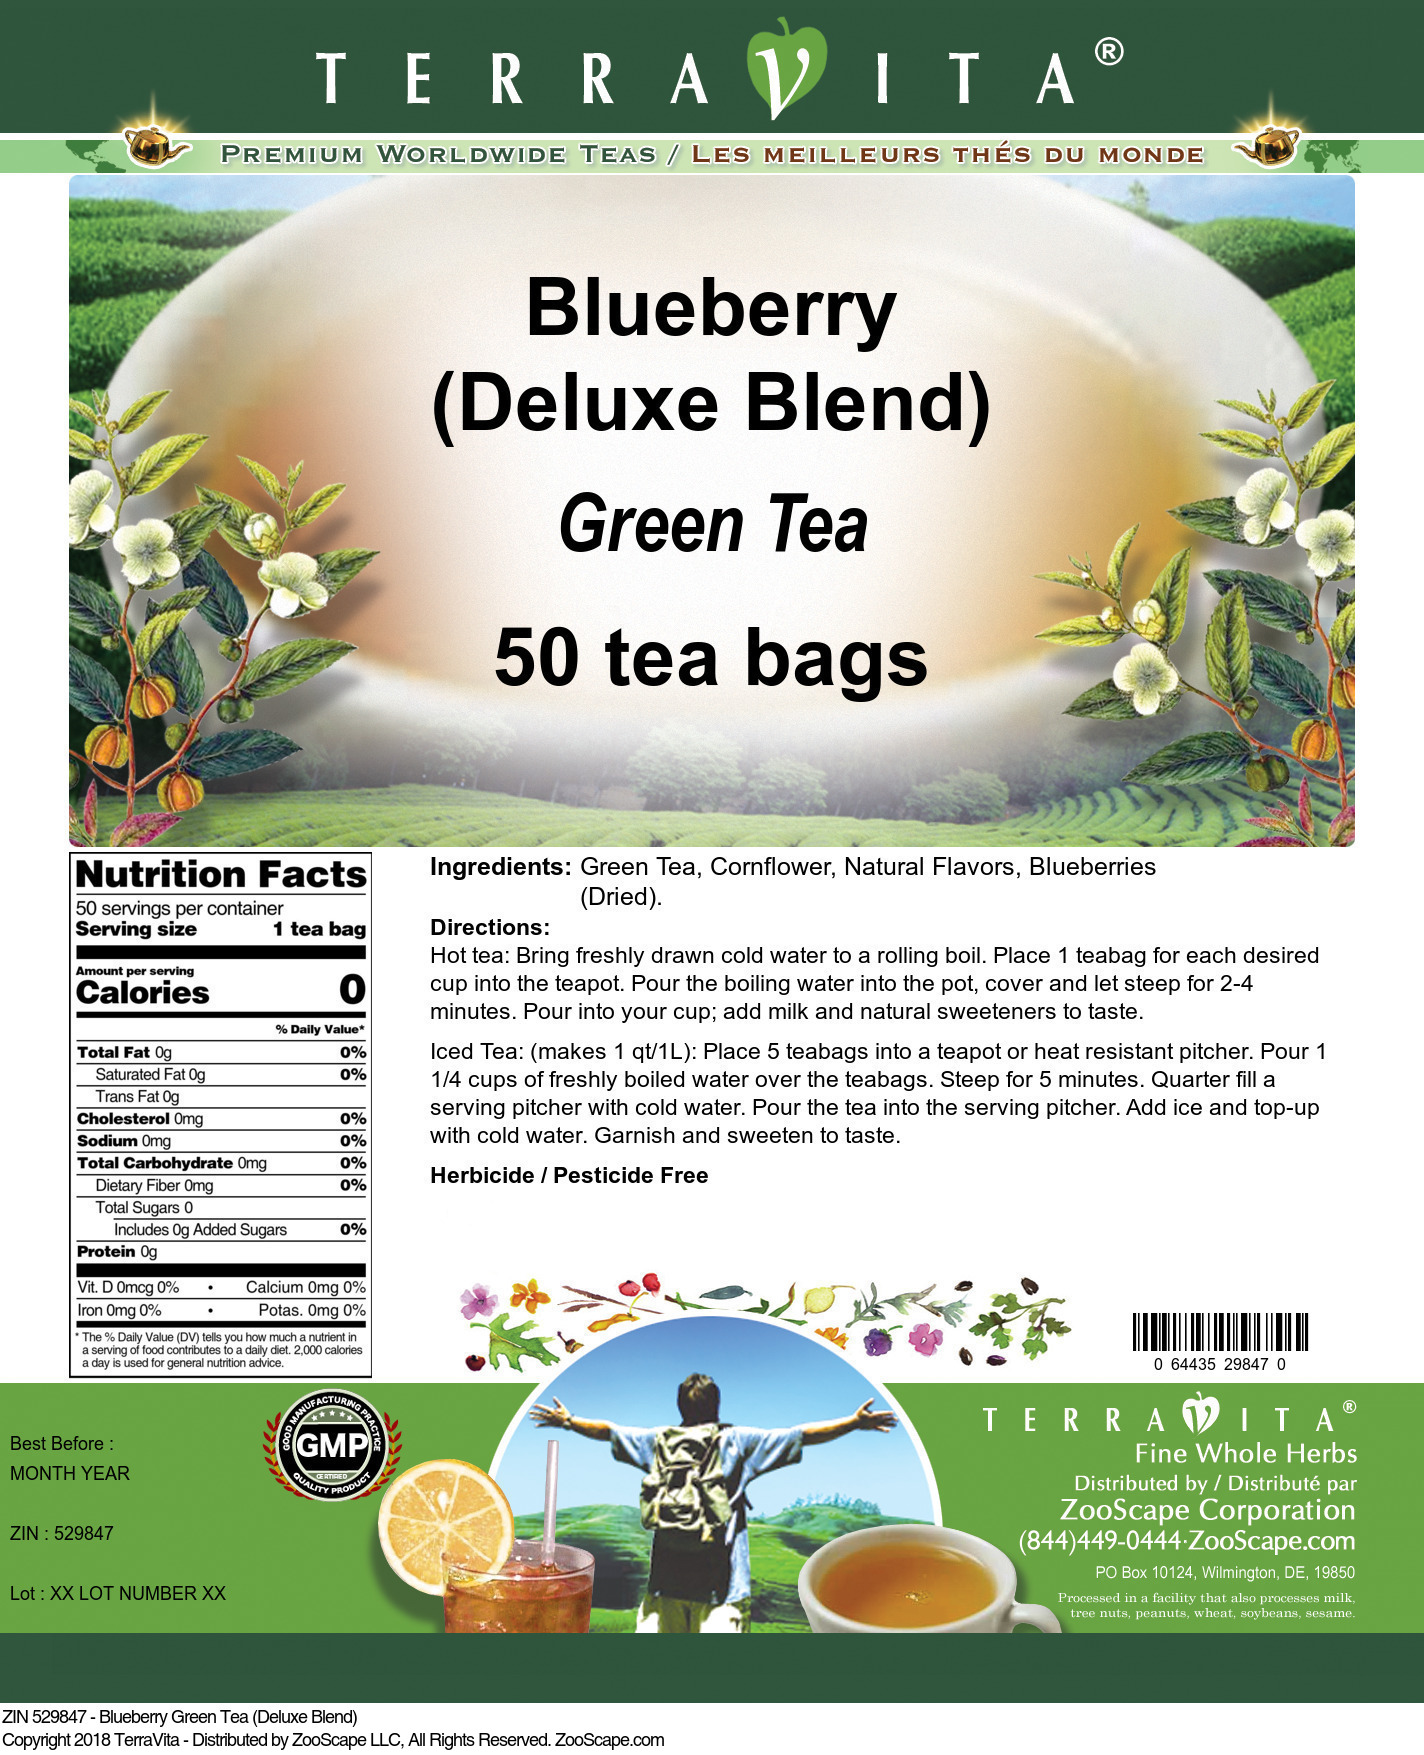 Blueberry Green Tea (Deluxe Blend)